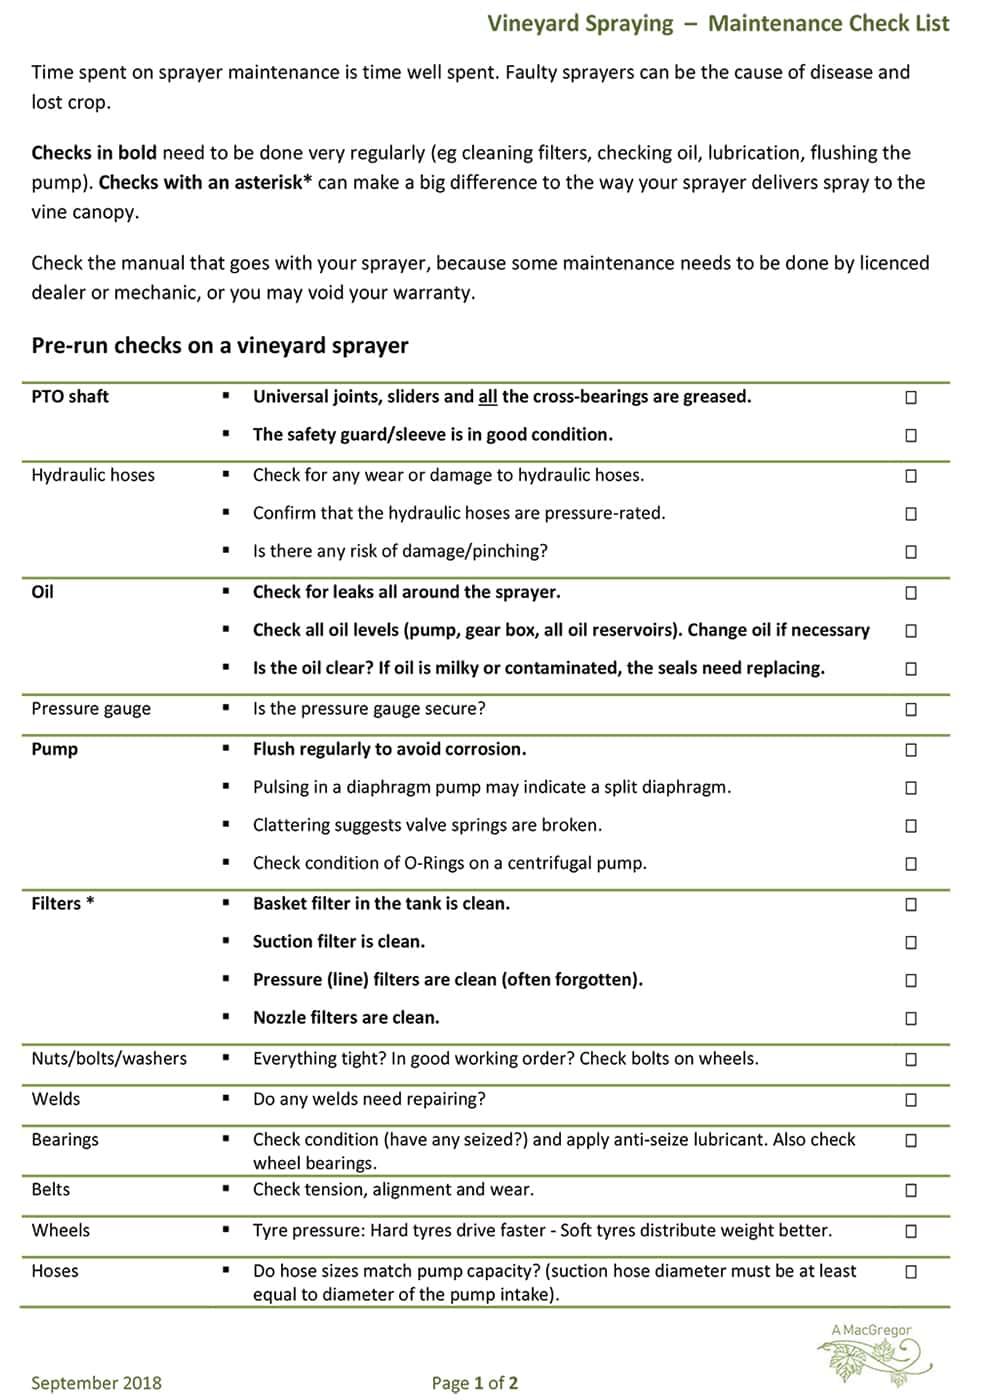 Vineyard Spraying – Maintenance Check List